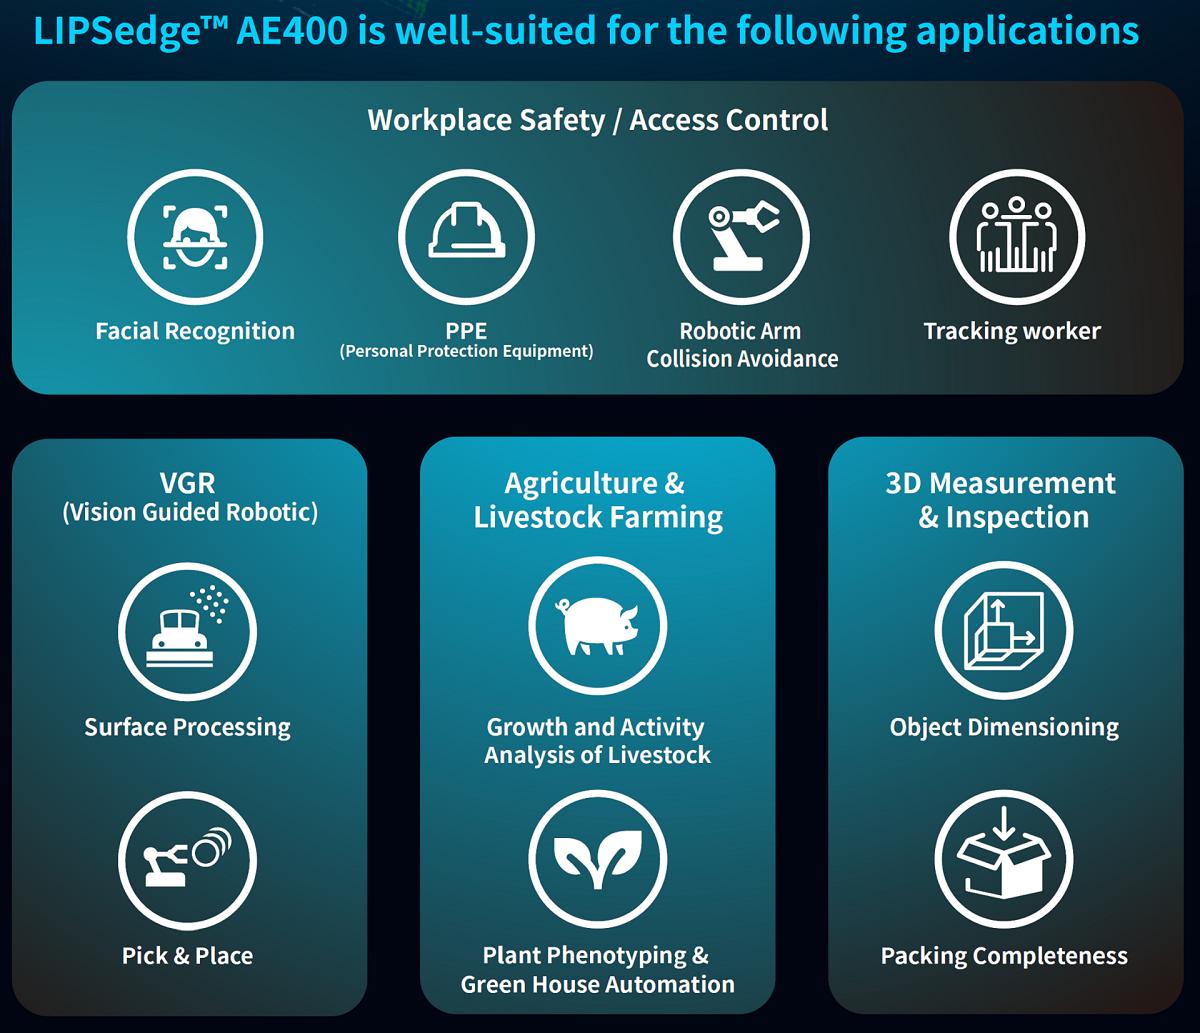 ae400_applications_sodavision